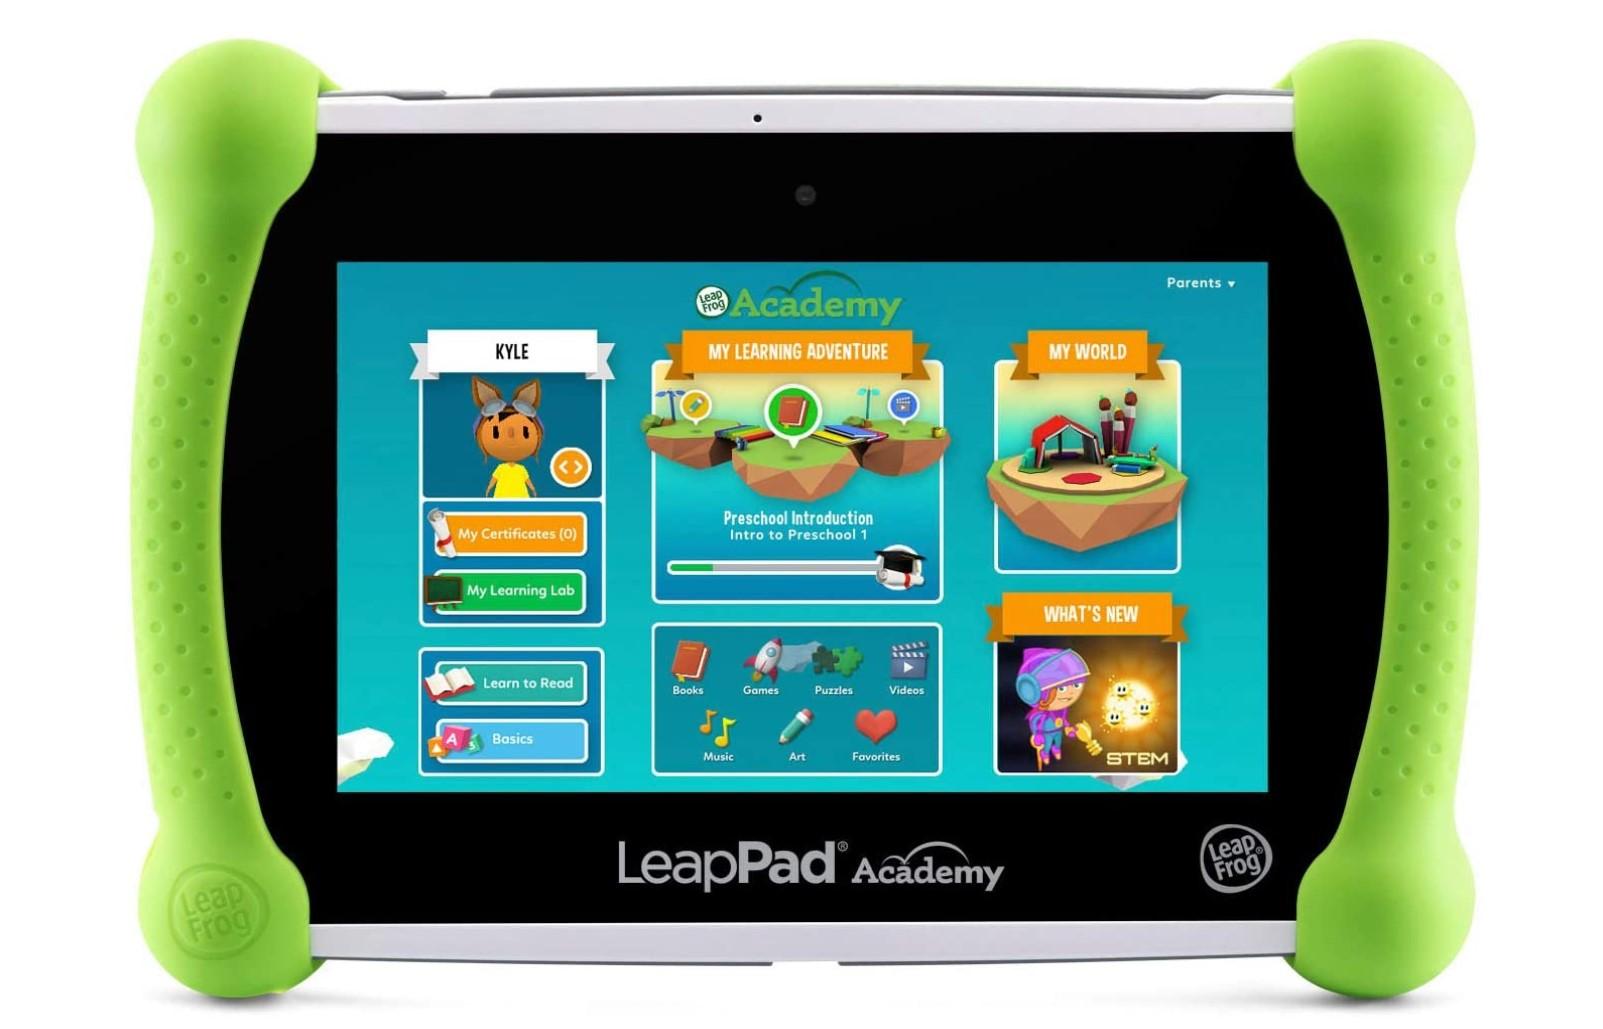 leappad academy kids tablet